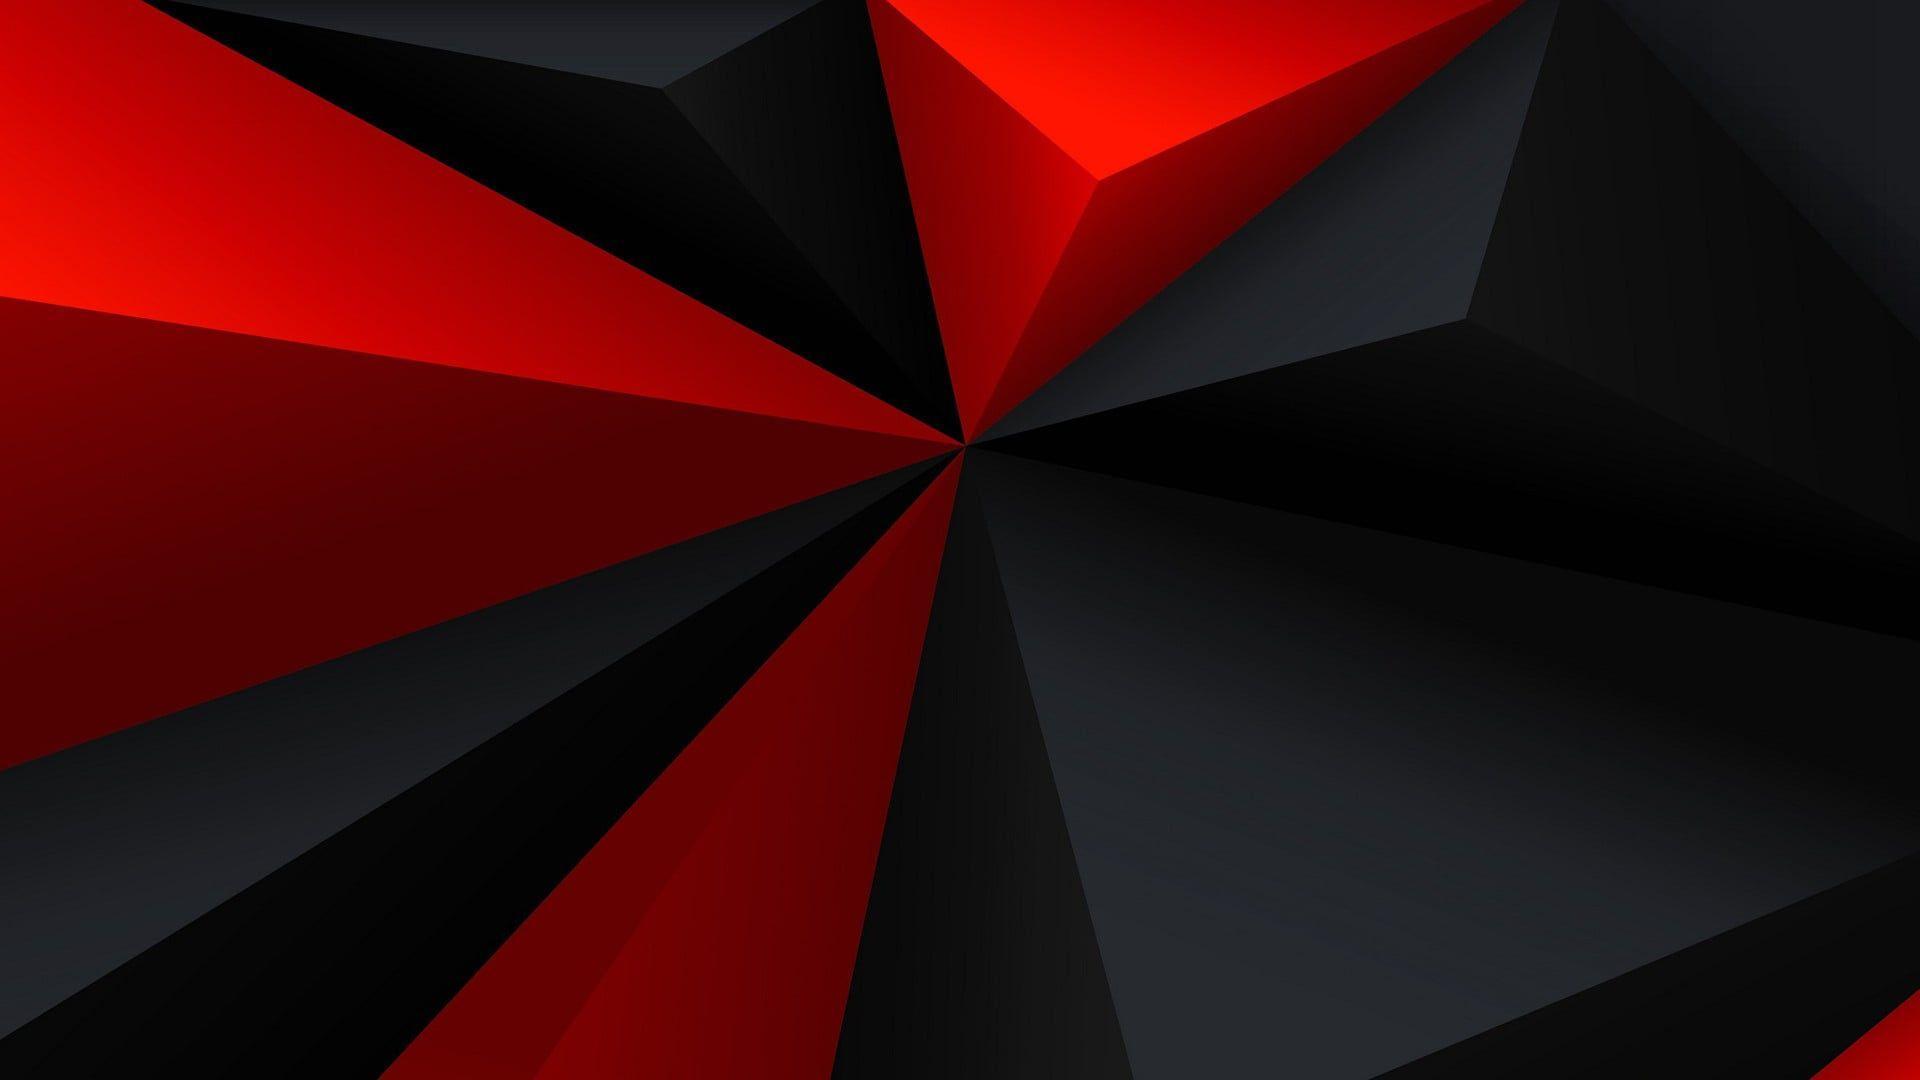 Minimalist Red and Black Wallpapers - Top Free Minimalist ...